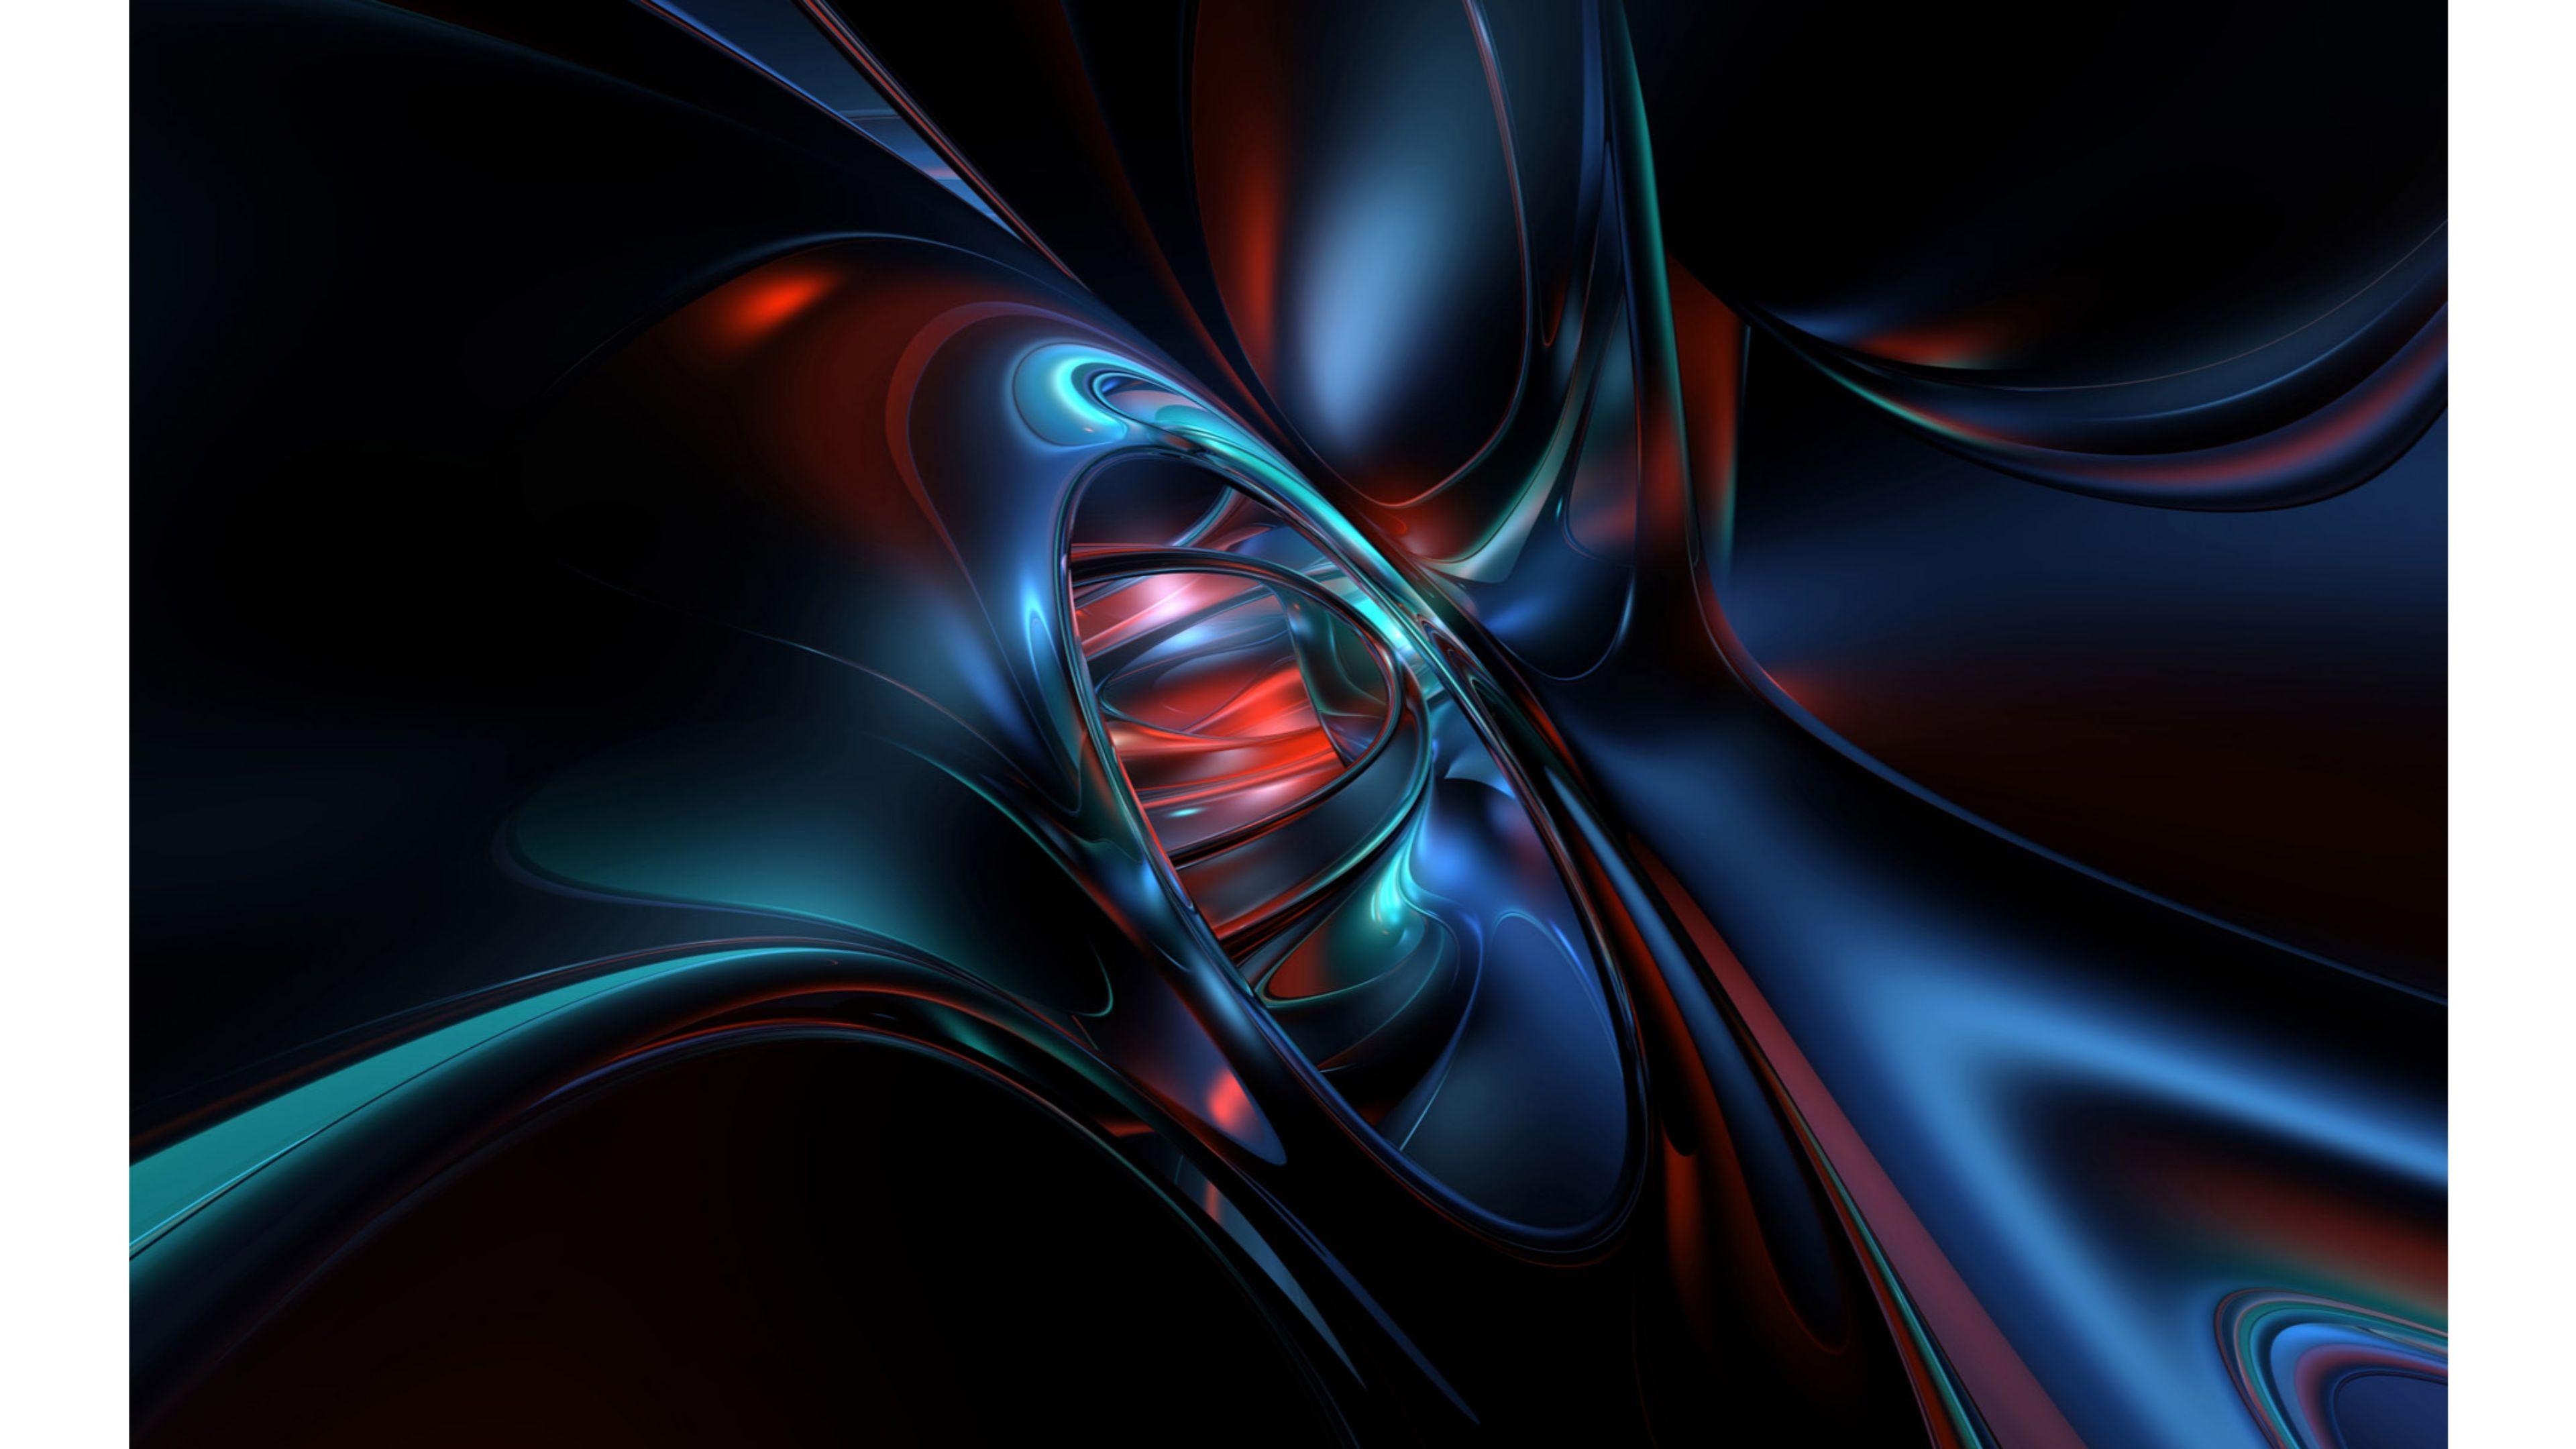 Abstract Colors Flashy Bird 4k: WallpaperSafari